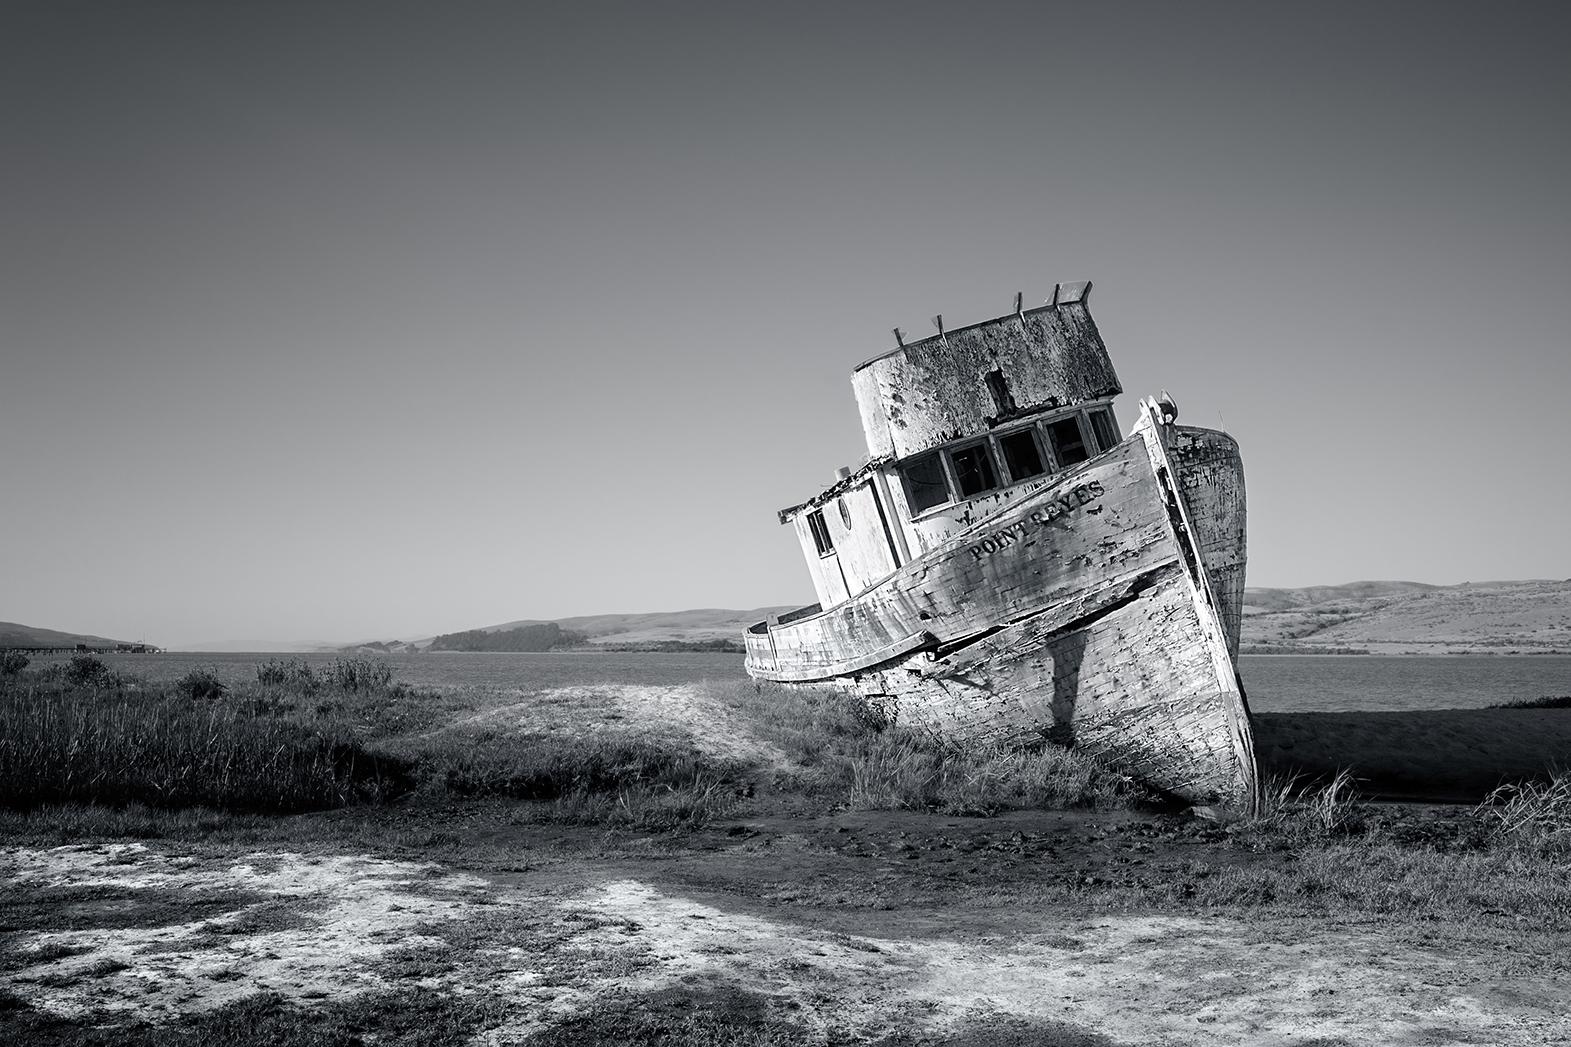 Tomales Bay Shipwreck, USA